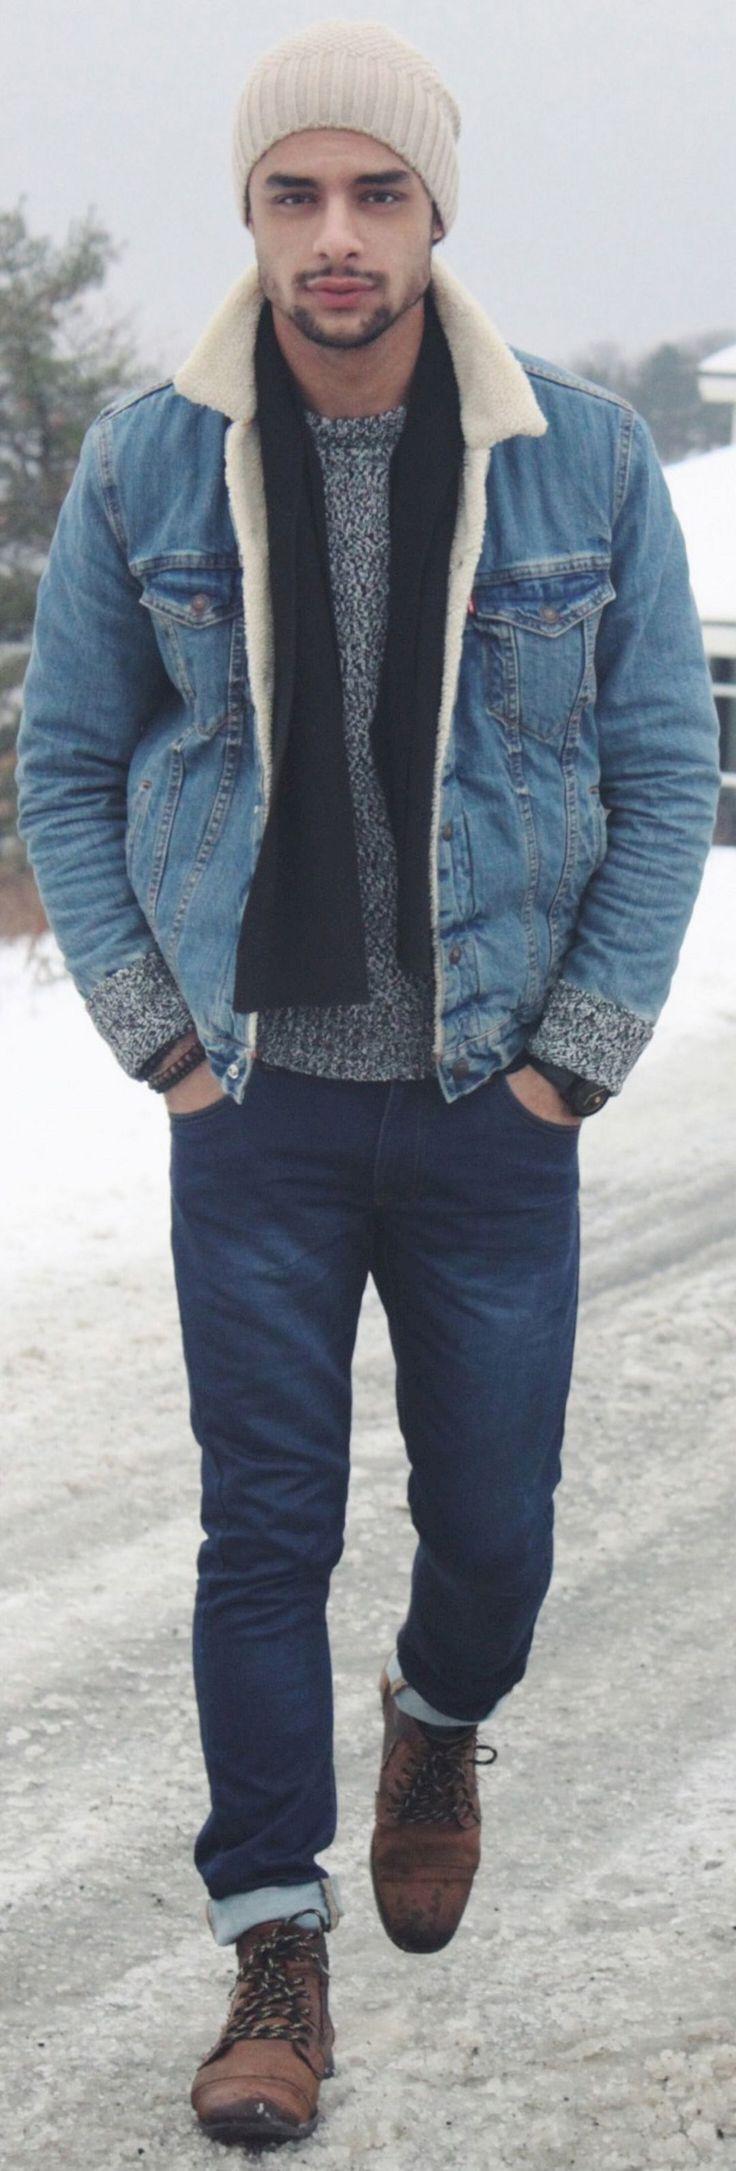 Amazing 35+ Most Popular Men Winter Outfit Ideas https://www.tukuoke.com/35-most-popular-men-winter-outfit-ideas-7119